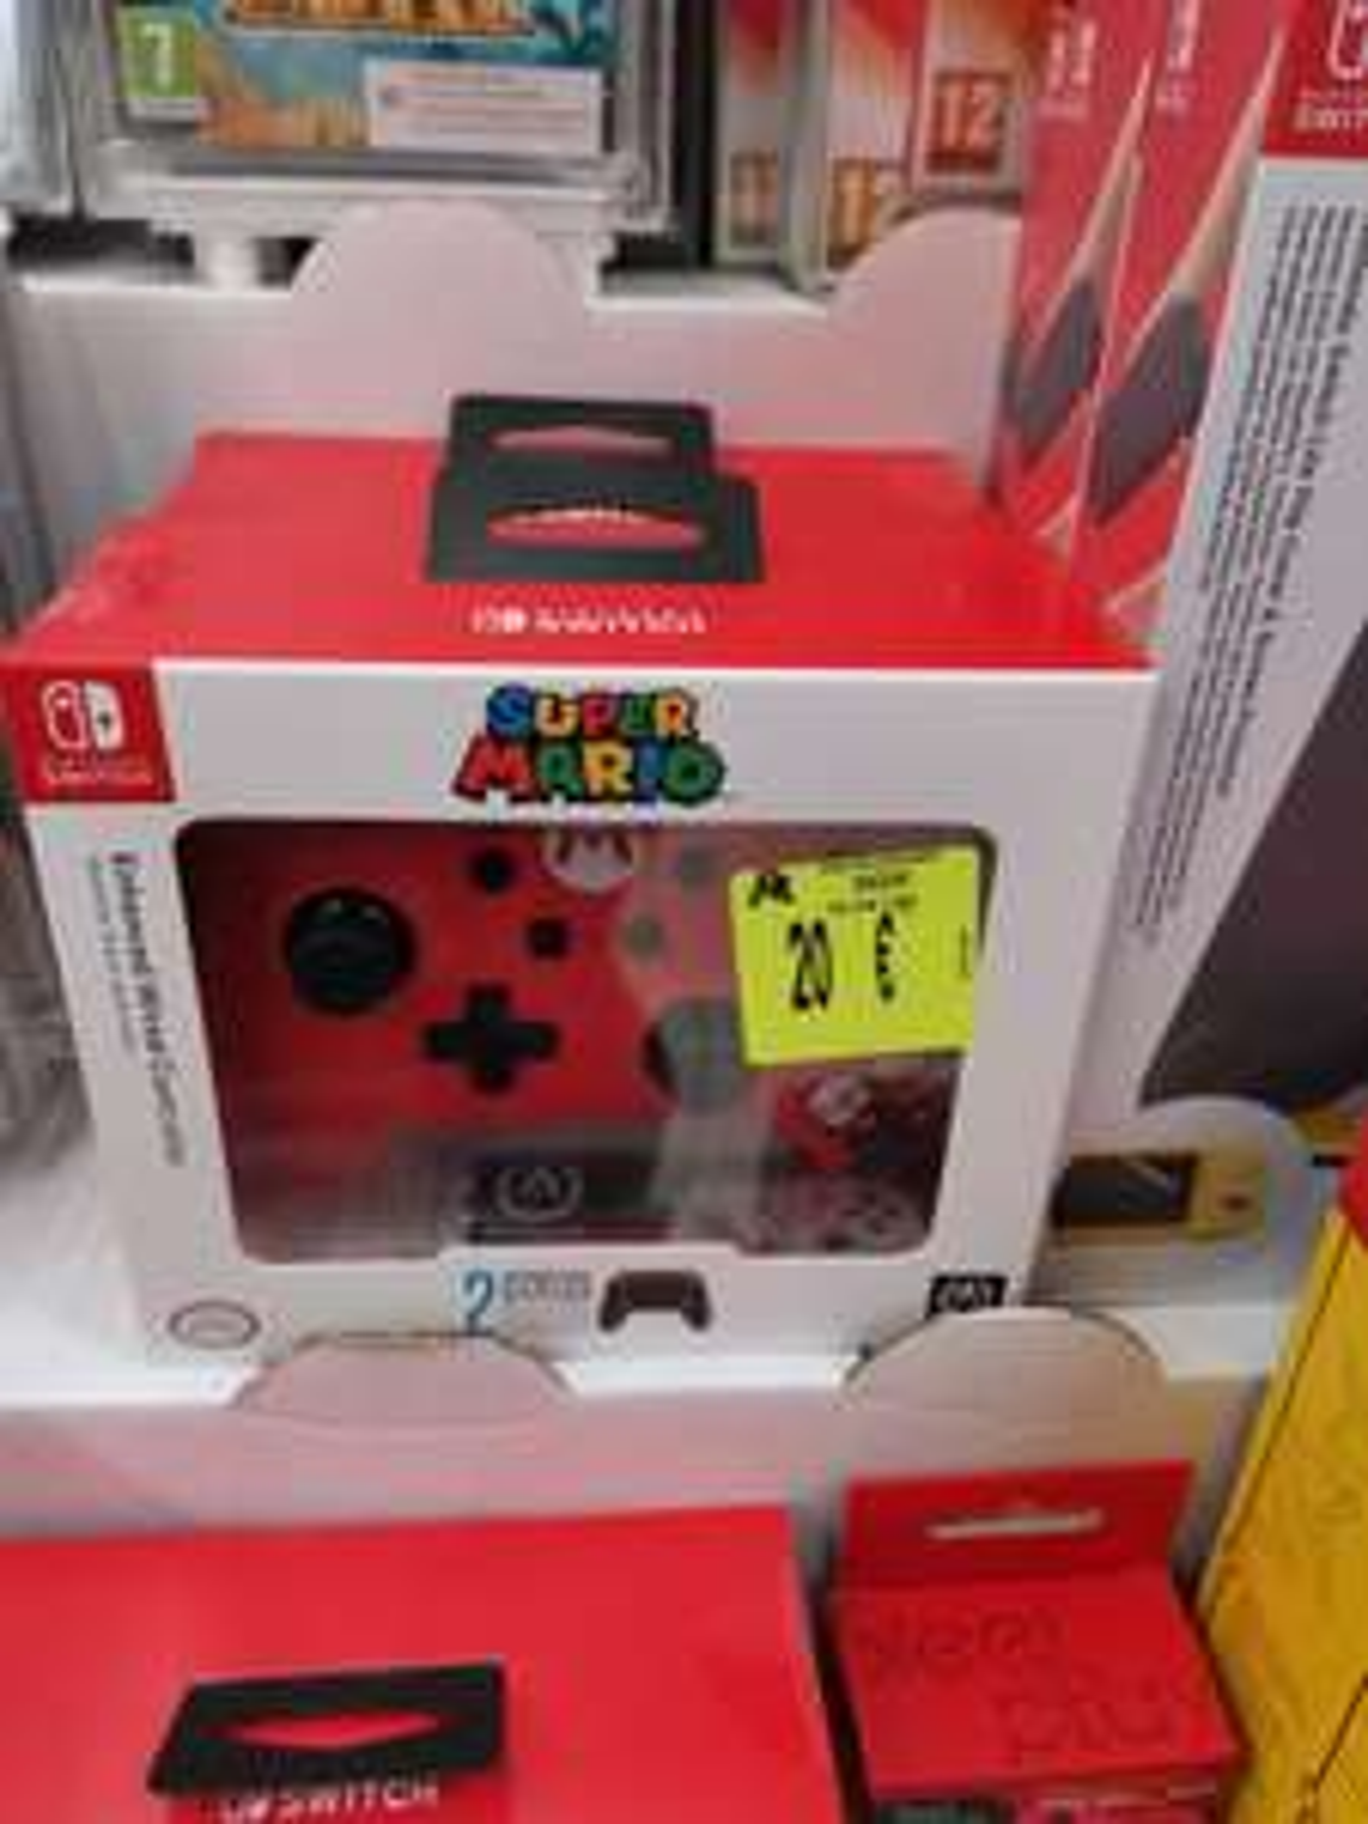 Manette filaire Nintendo Switch Super Mario - Auchan semécourt (57)